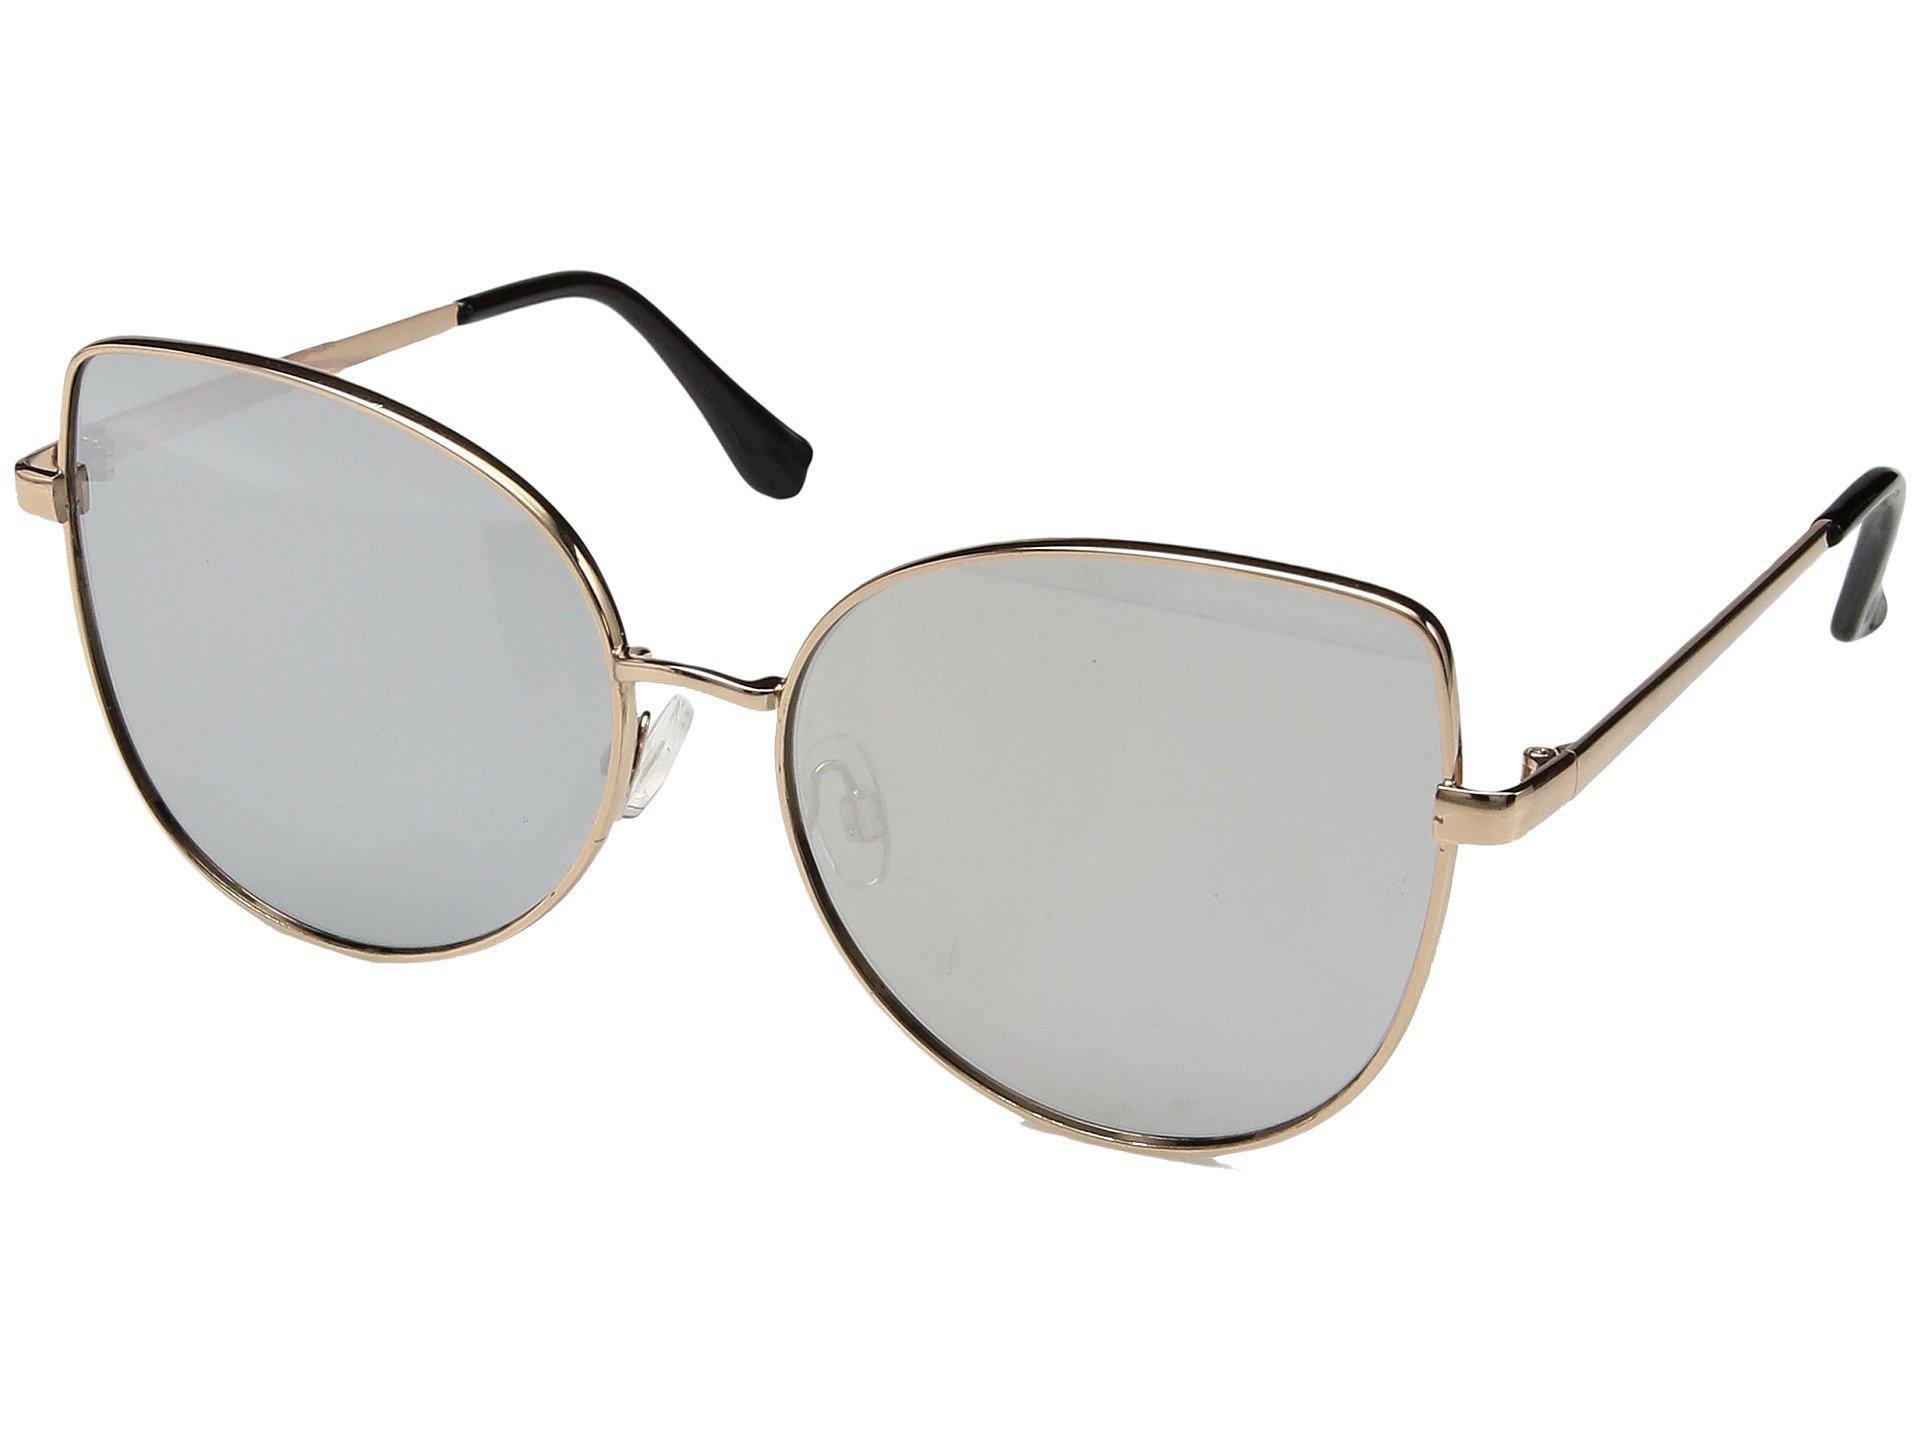 San diego hat company Metal Frame Cat Eyes Sunglasses in Metallic | Lyst